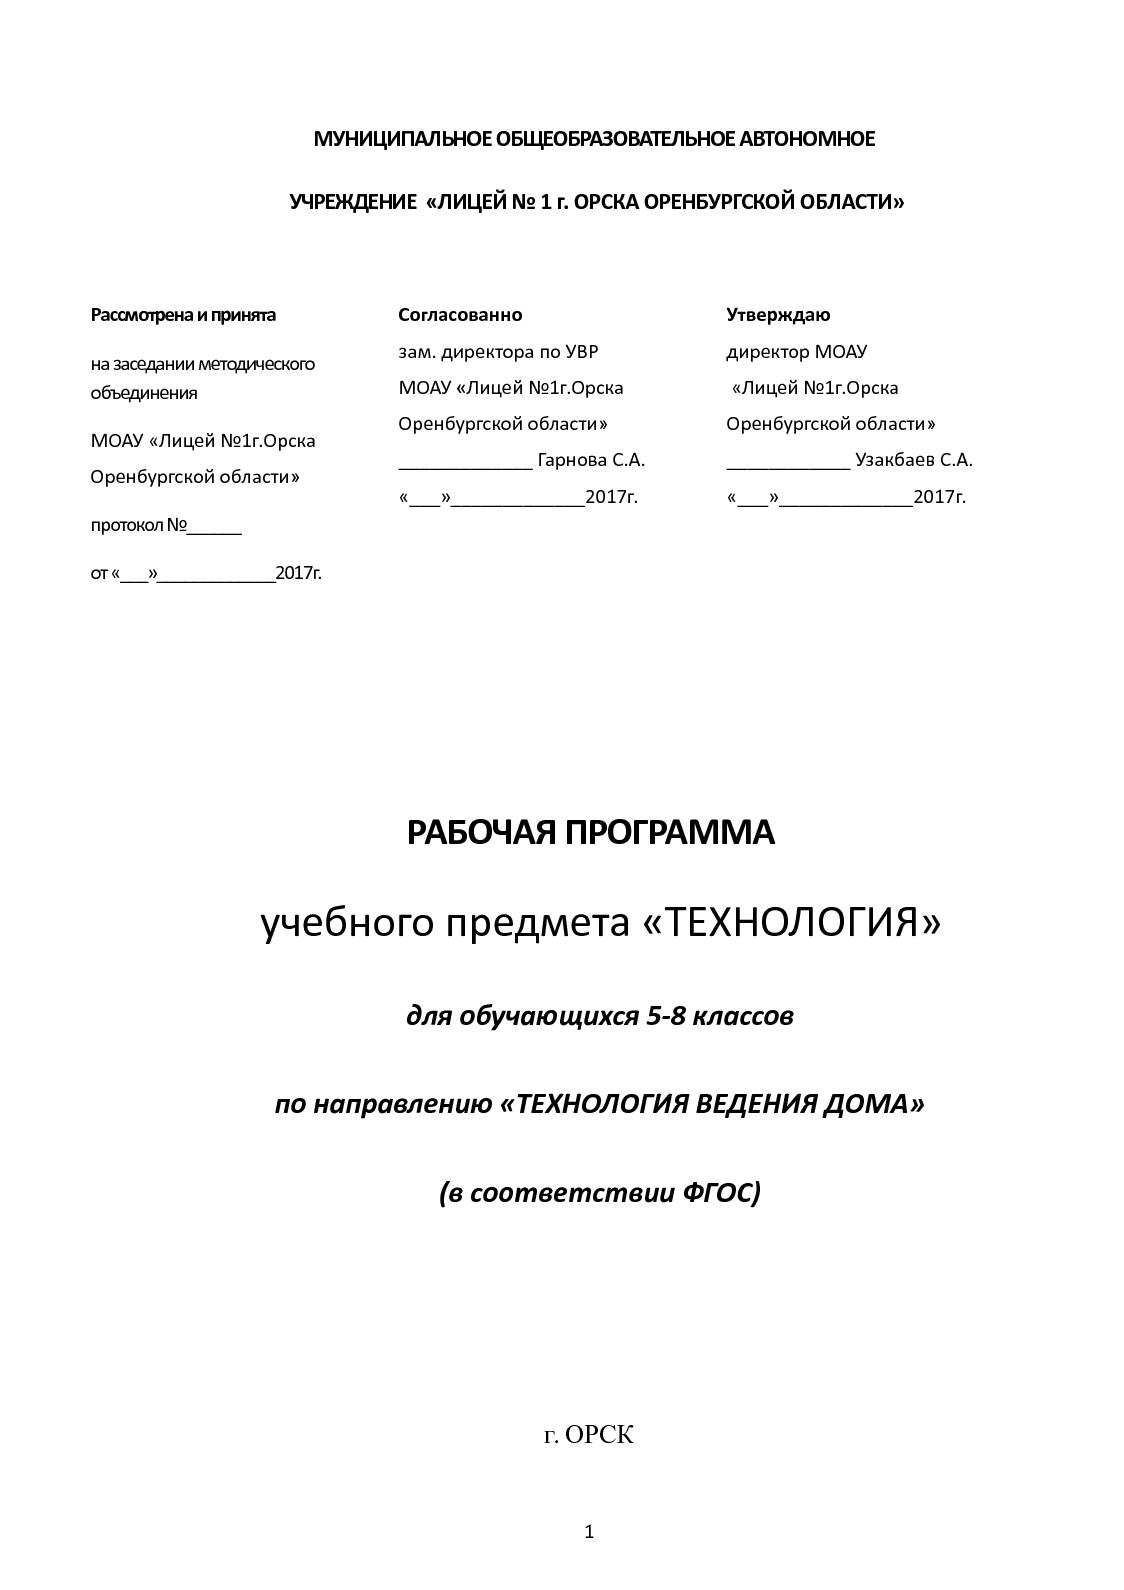 Урок 6 морфологический анализ-11 класс технология по симоненко